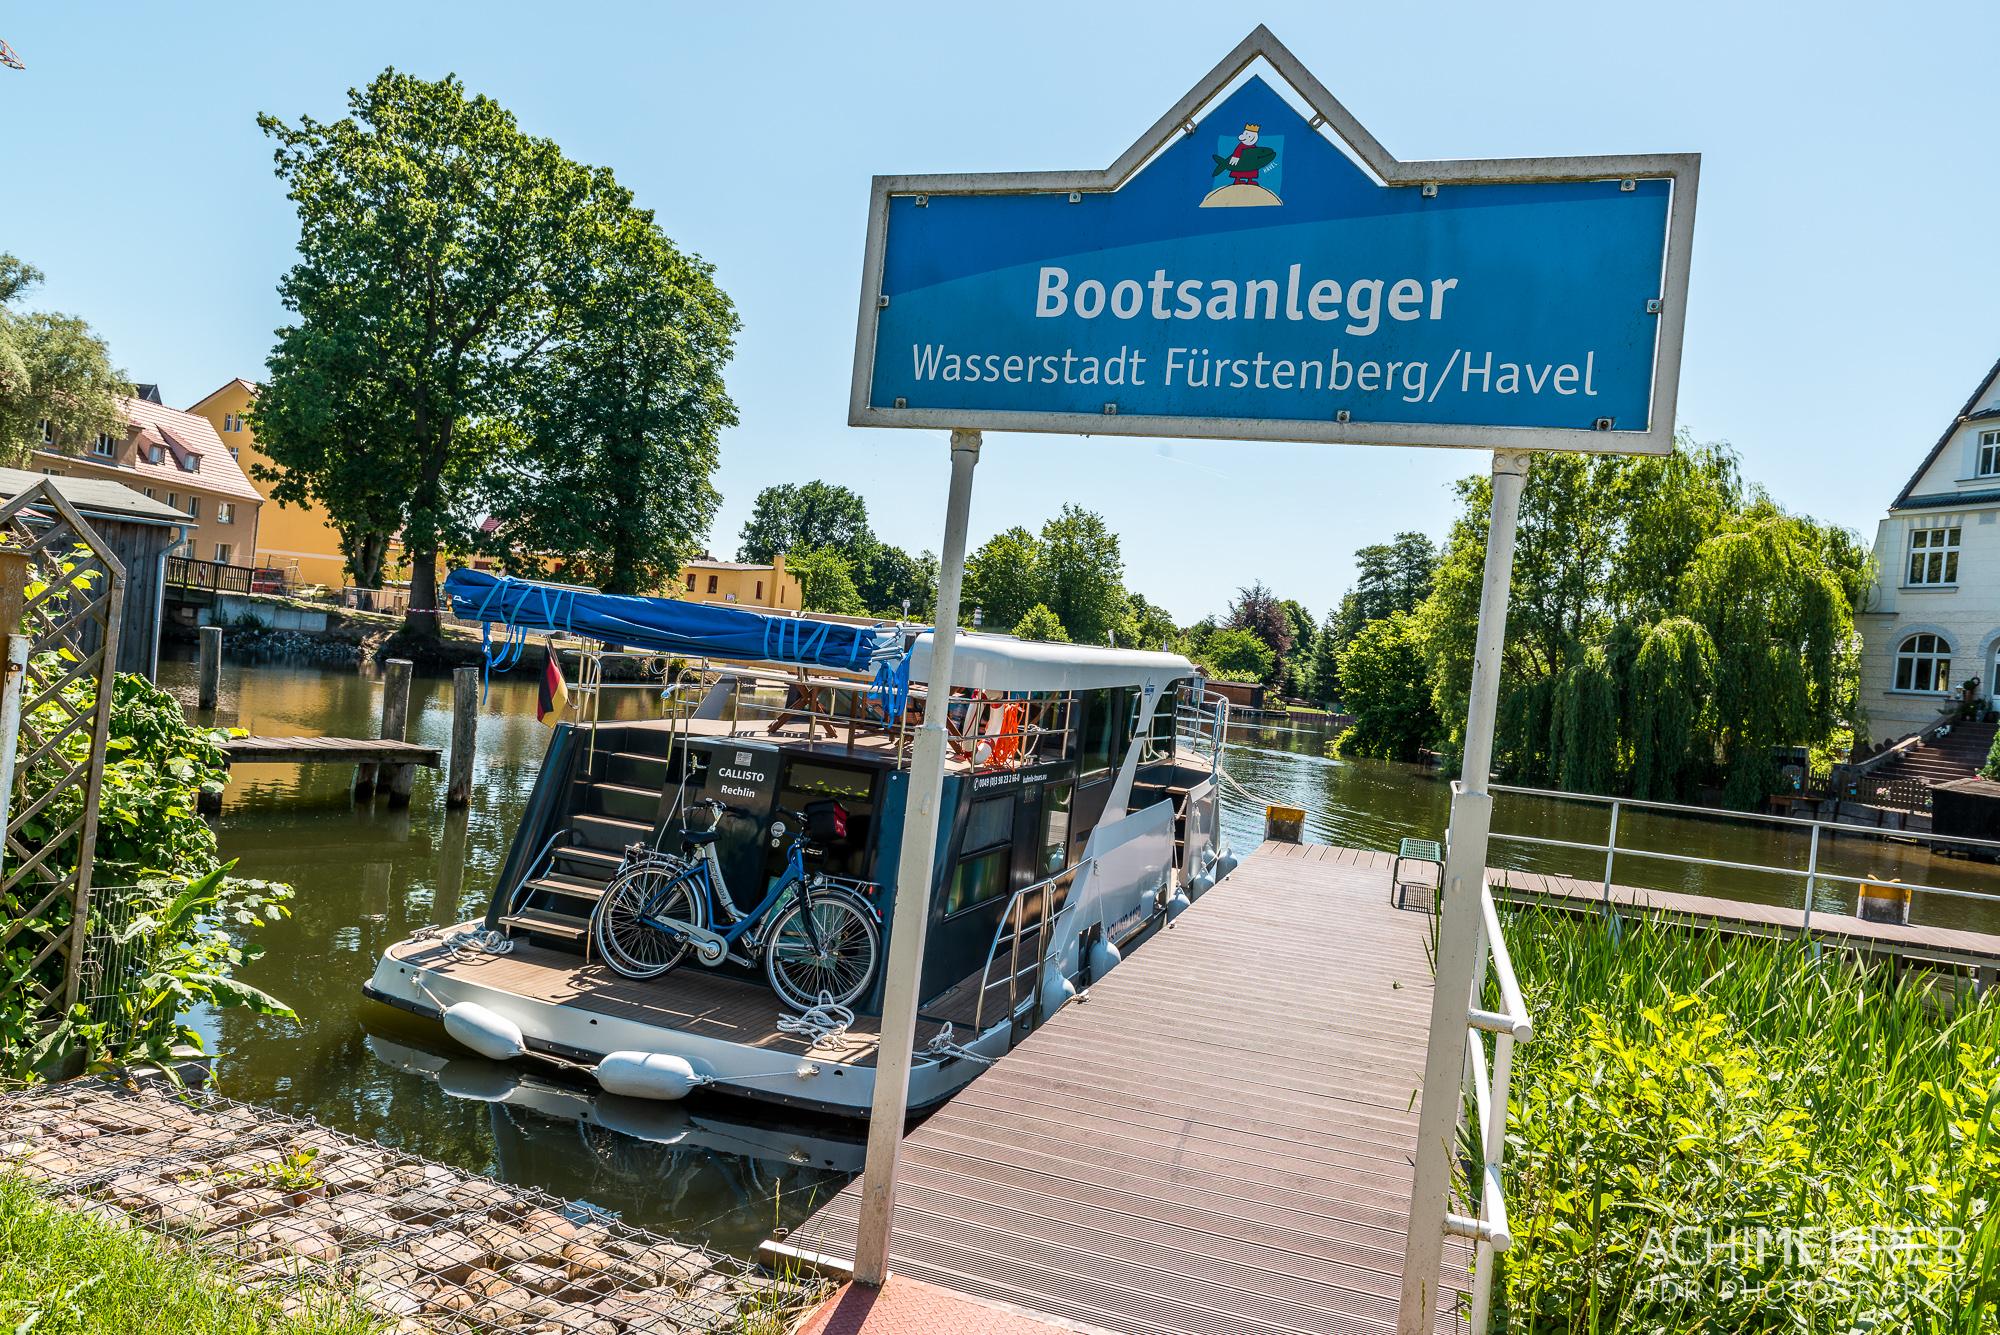 Hausboot-Kuhnle-Mueritz-Mecklenburg-Vorpommern-See_3168